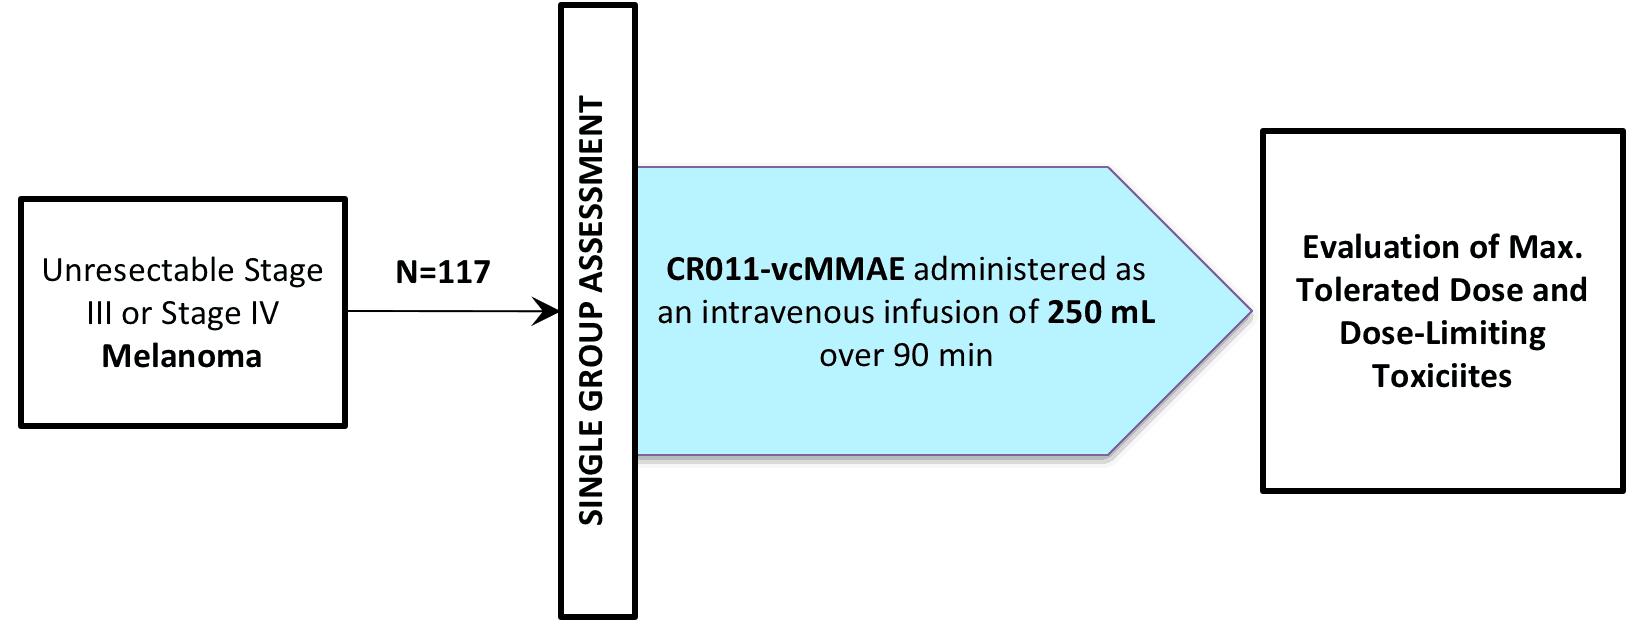 NCT00412828 (CLINICAL TRIAL / GLEMBATUMUMAB VEDOTIN / CDX-011 / CR011-VCMMAE)